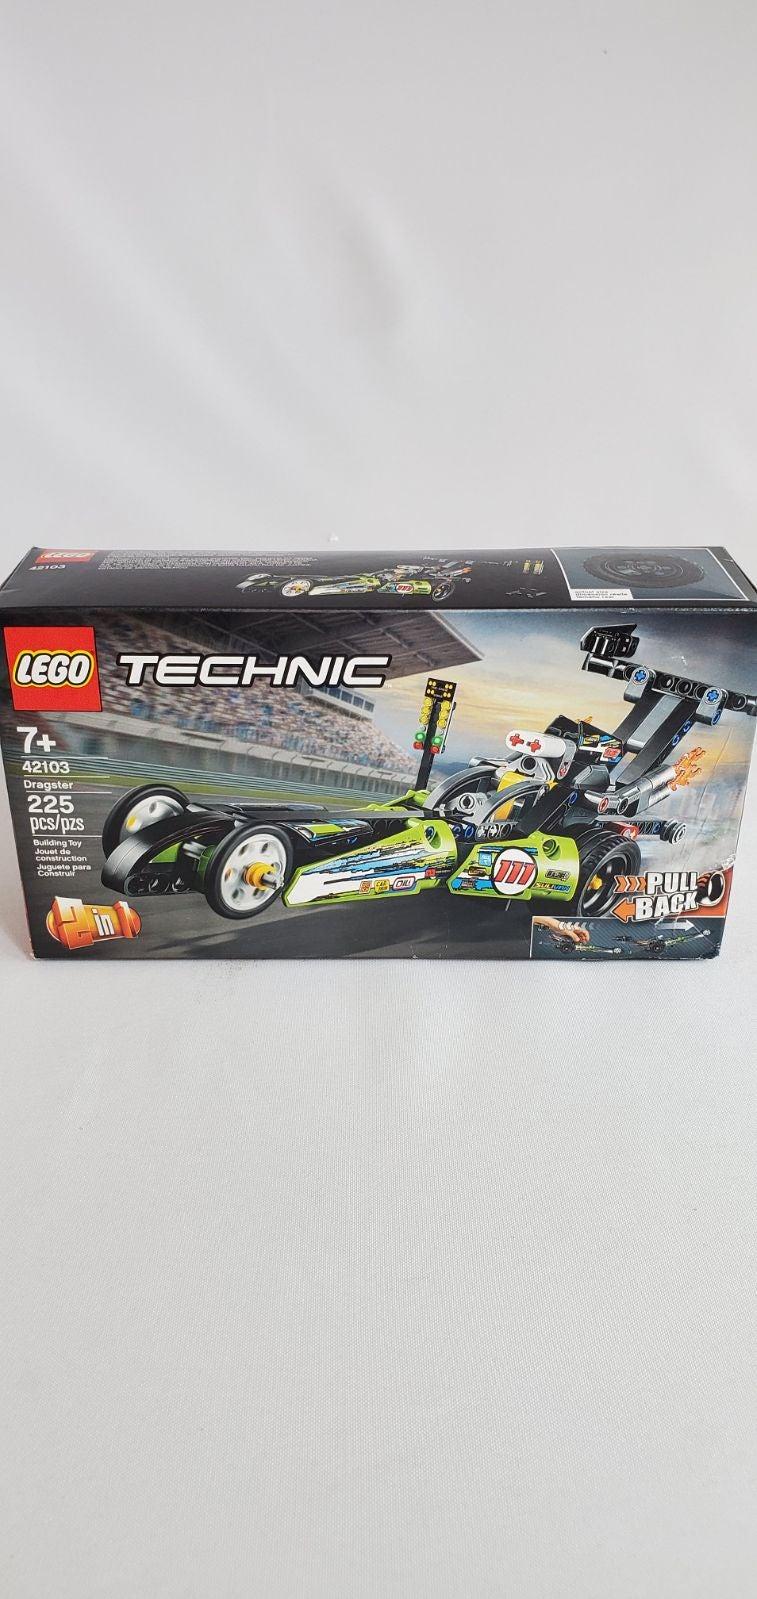 LEGO Technic: